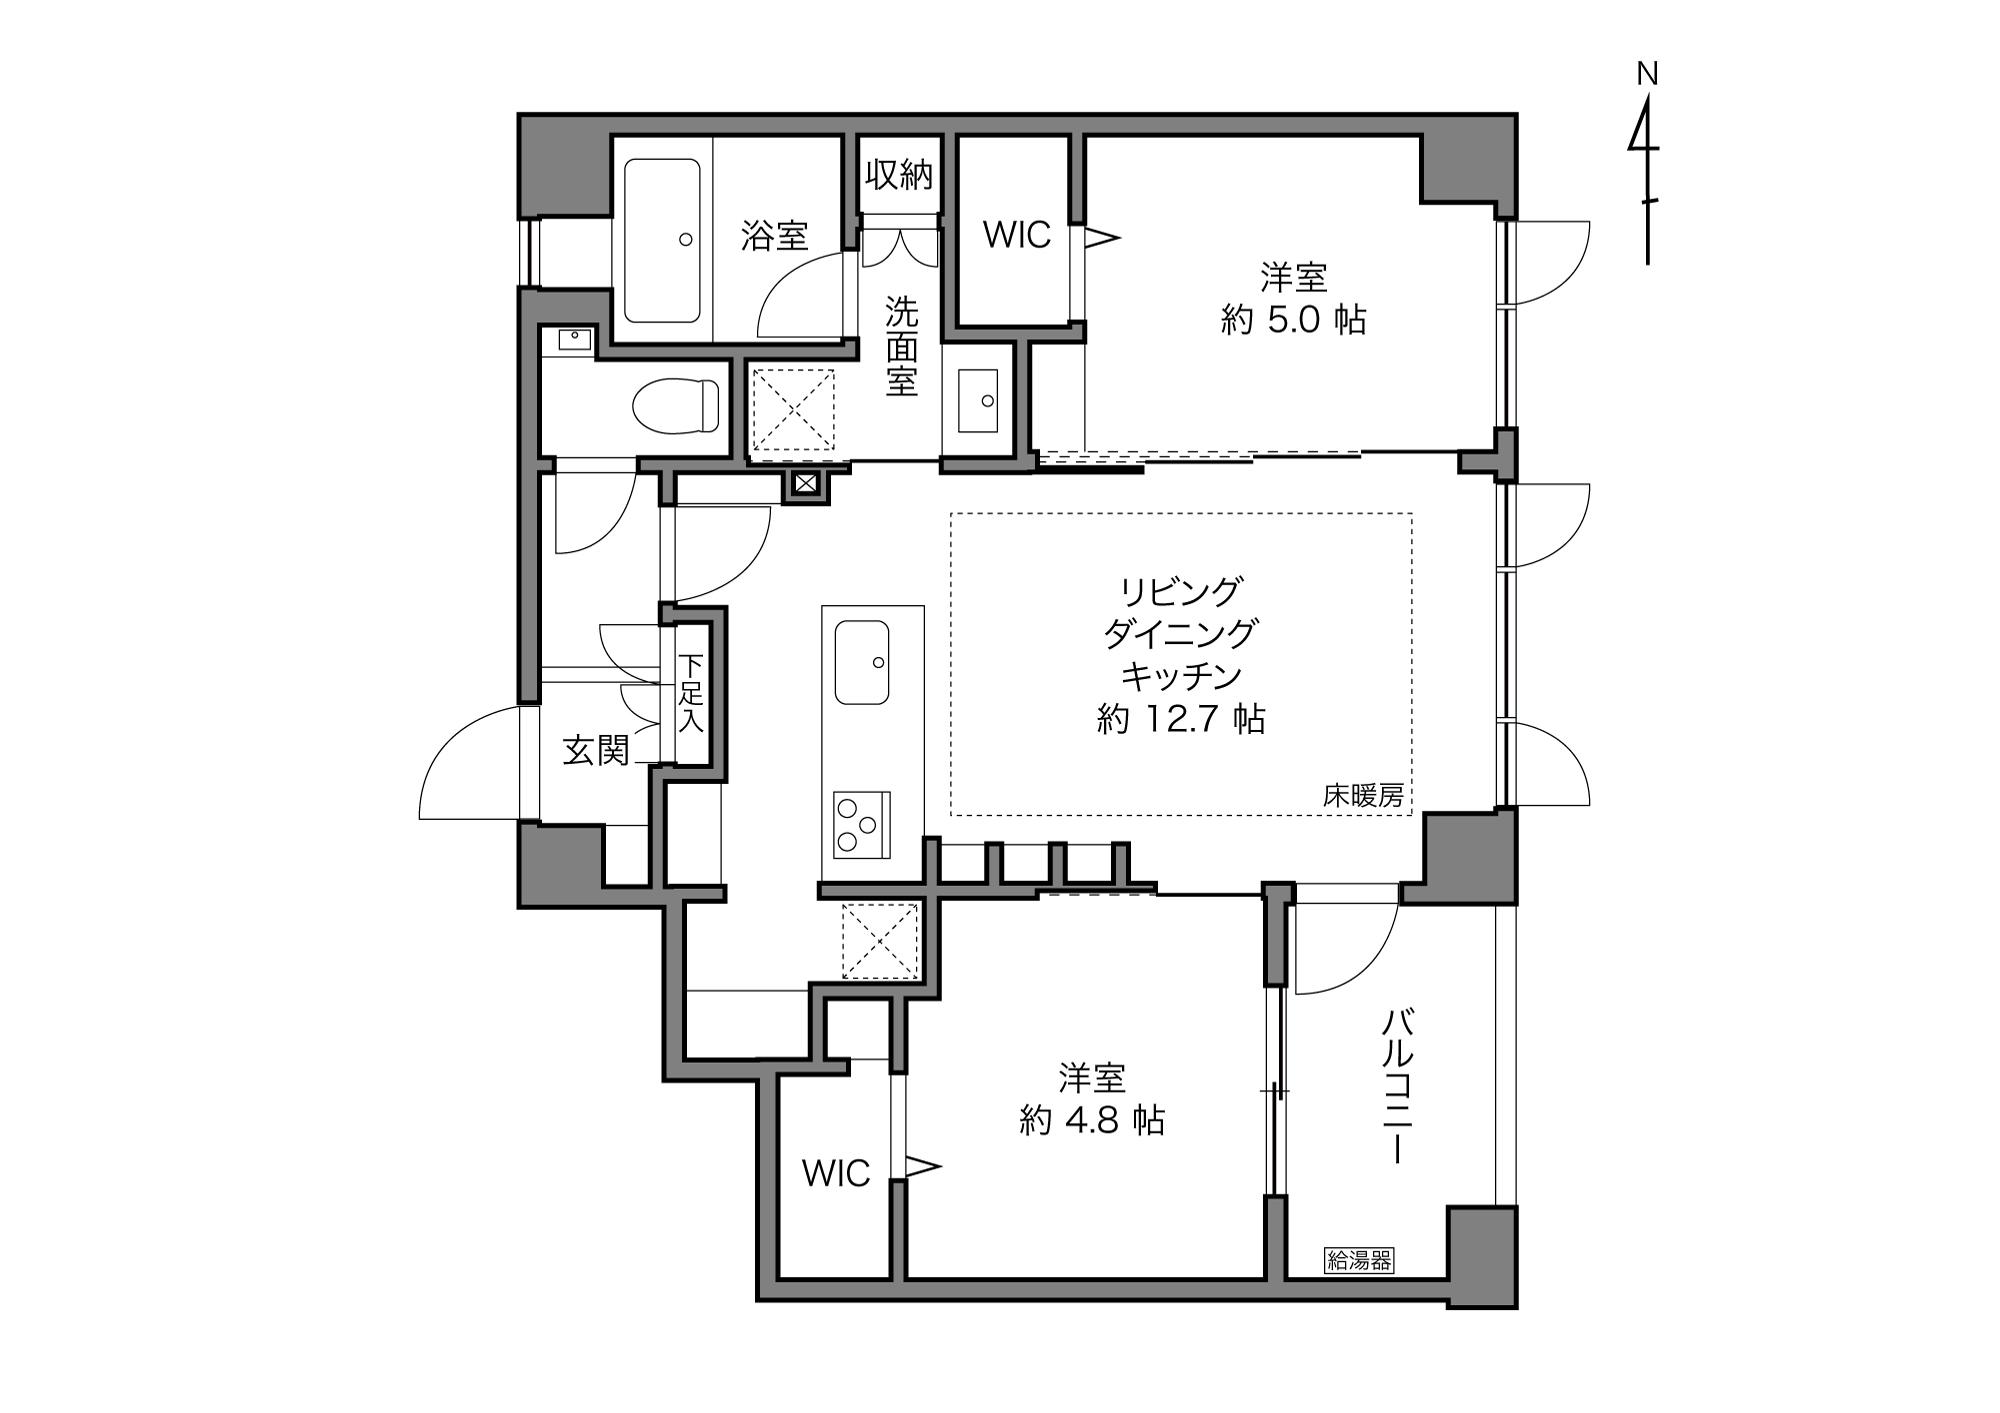 八幡山駅 / 2LDK+2WIC / 53.34㎡